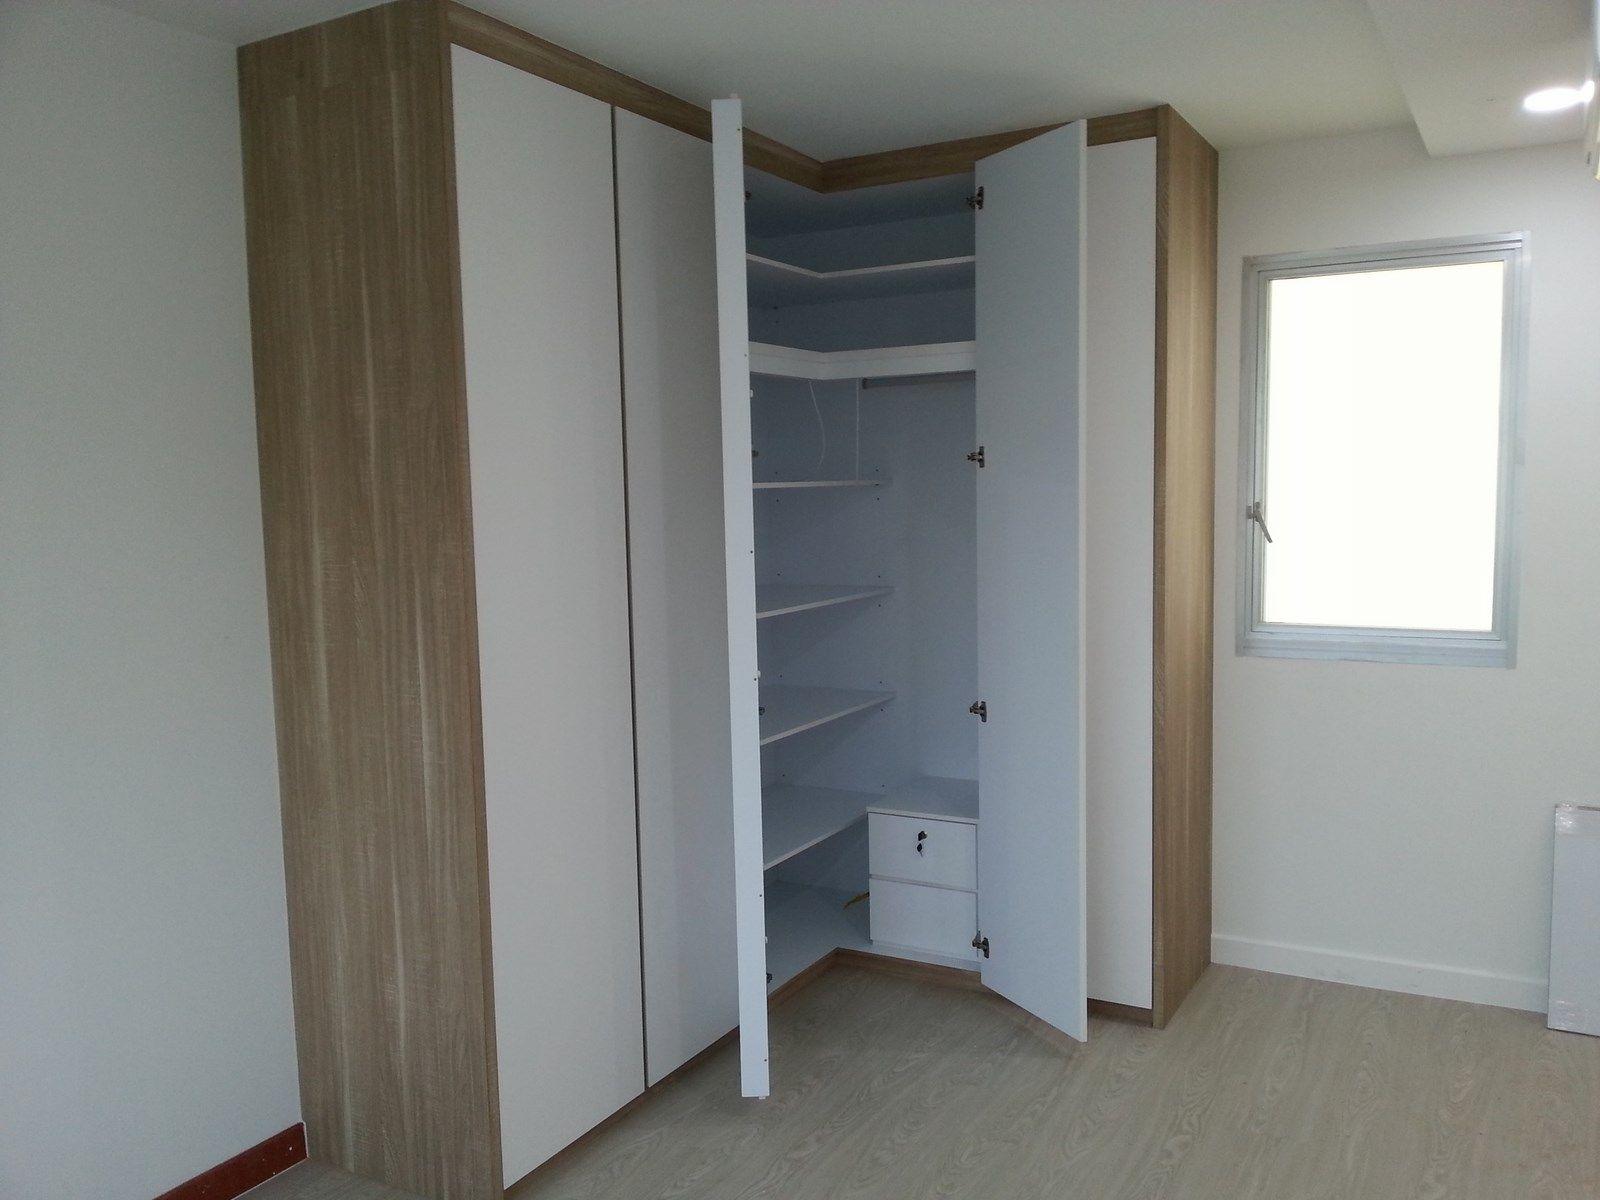 glamorous closet design renotalk roselawnlutheran. Black Bedroom Furniture Sets. Home Design Ideas